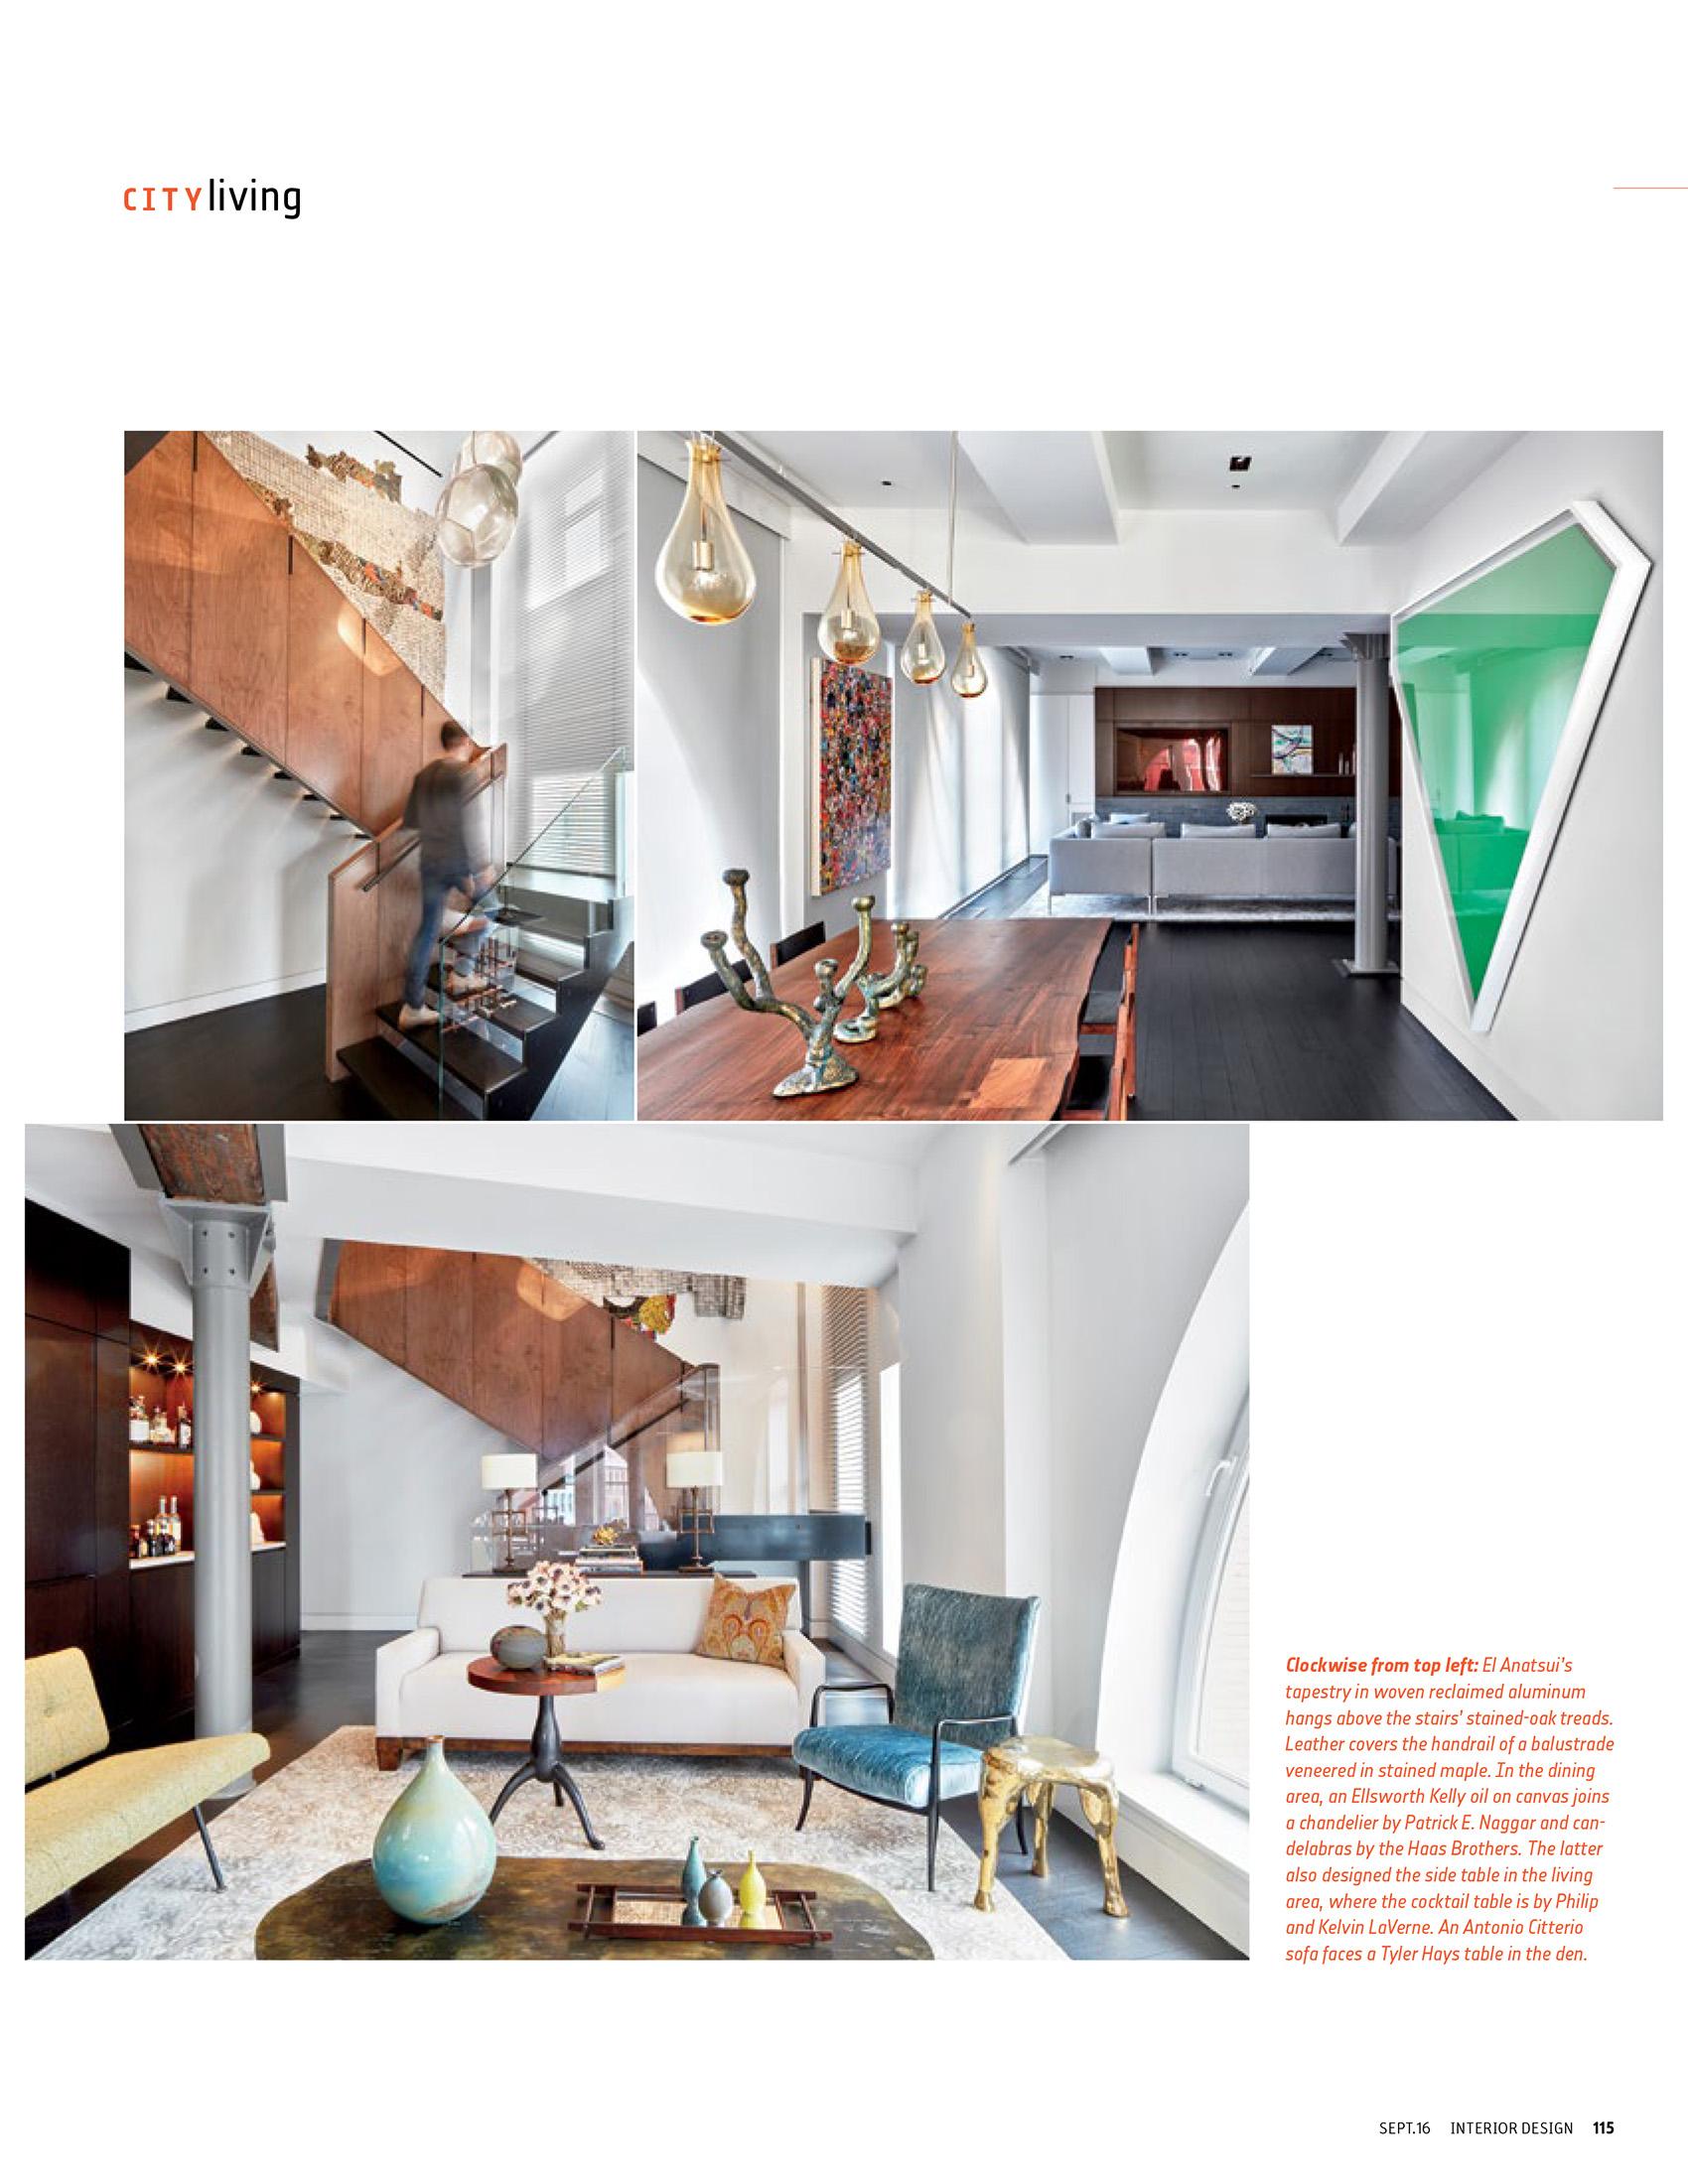 Interior-Design_161-Duane-St_Oct-16_Page-2B.jpg